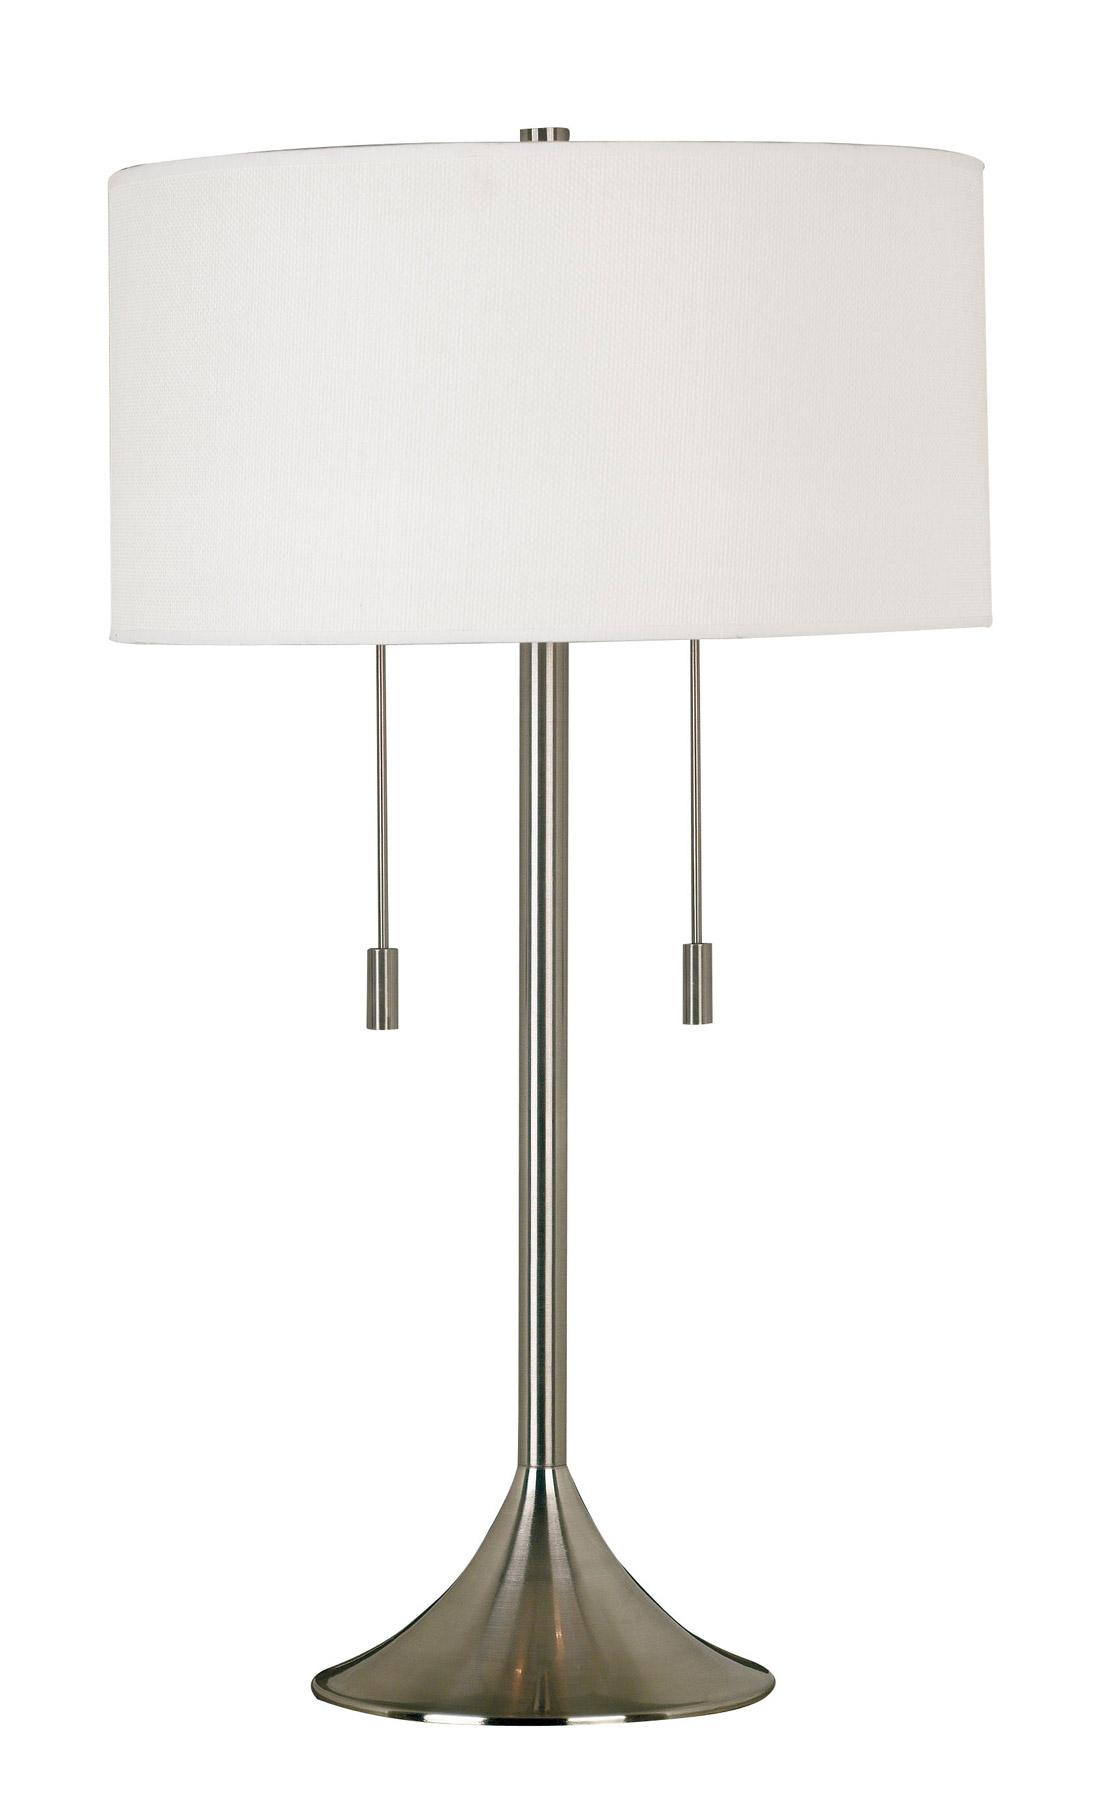 Kenroy home 21404bs stowe table lamp - Kenay home lamparas ...